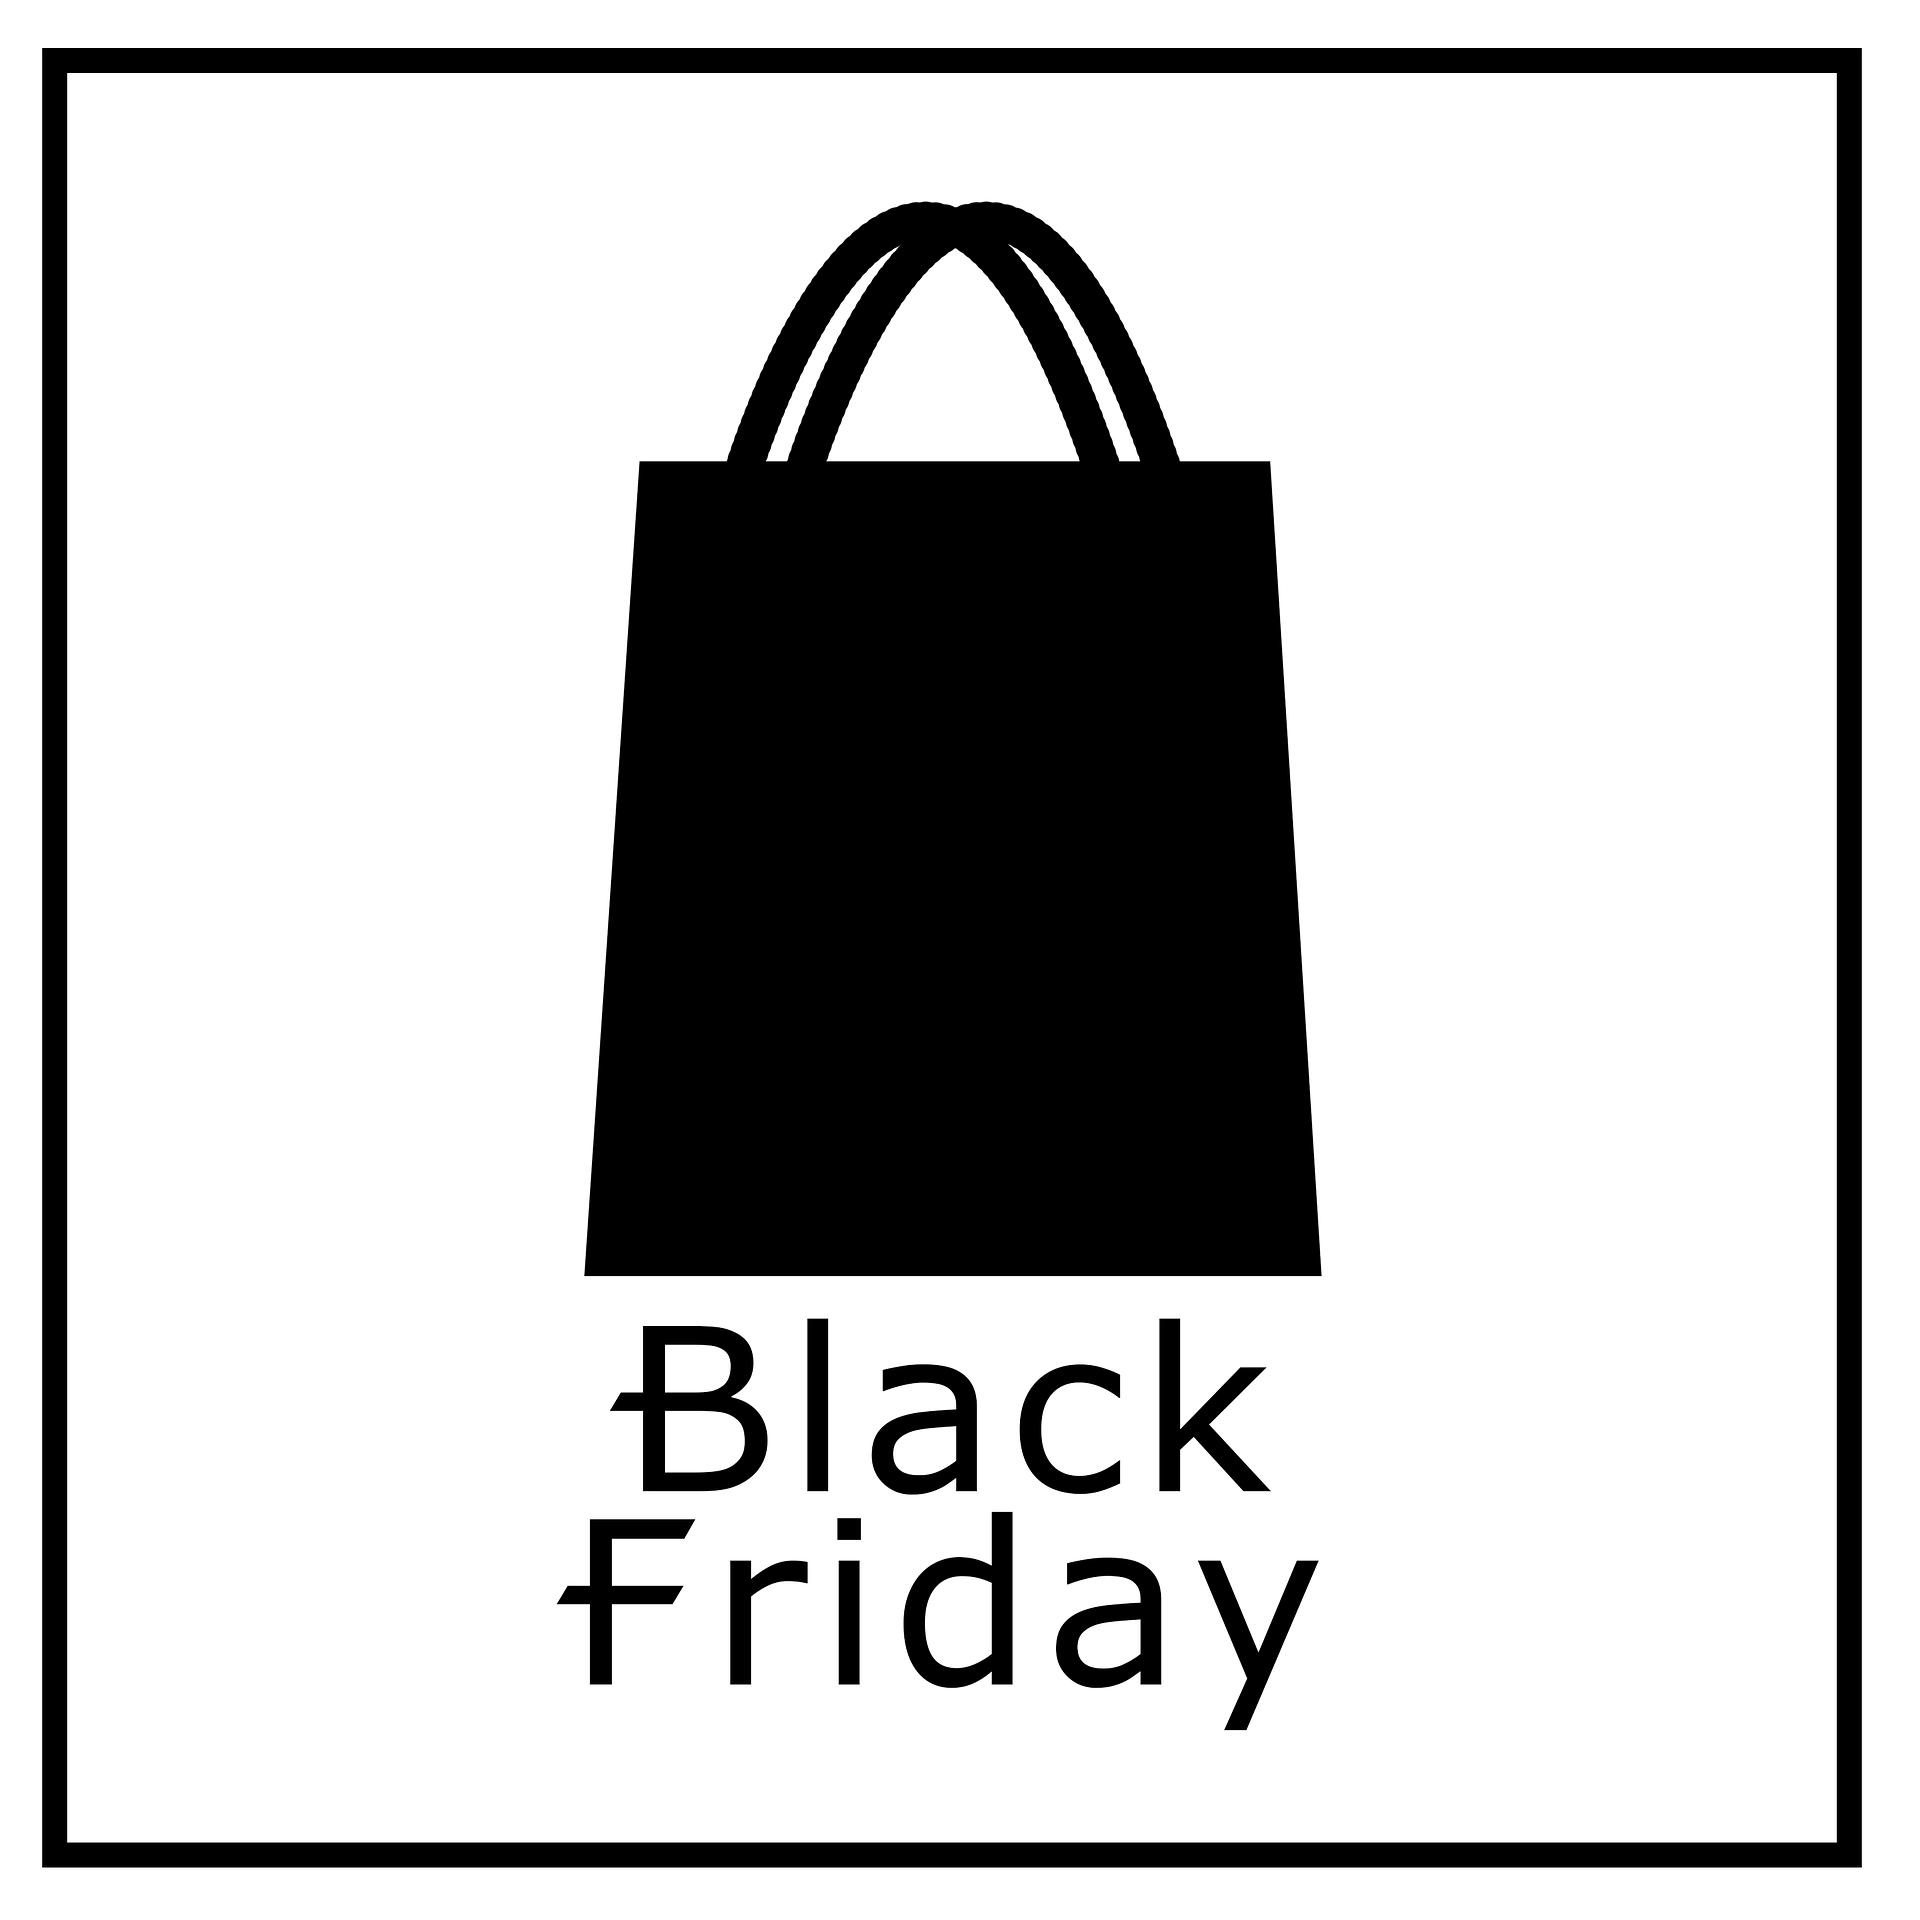 black-friday-2901754_1920